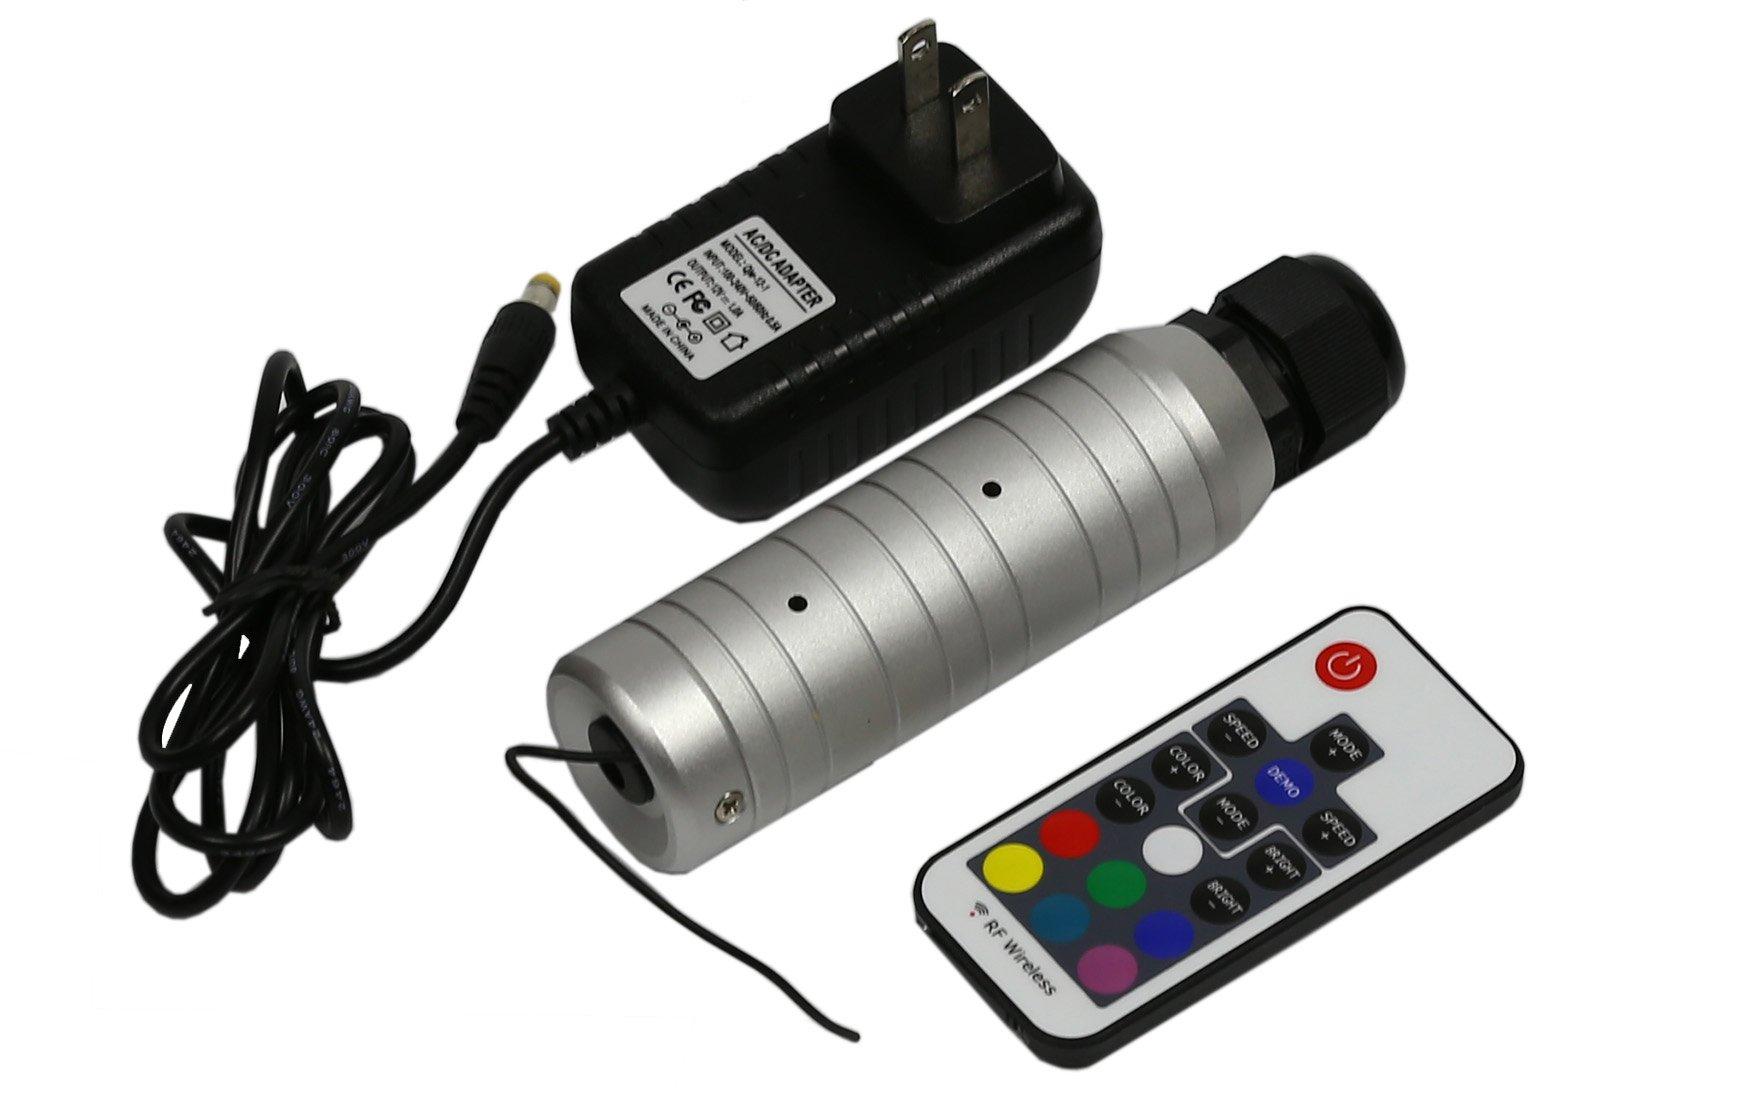 Fiber Optic Light Source 6w Led Light Rf Remote RGB Colors Change for Home Decoration Night Lighting